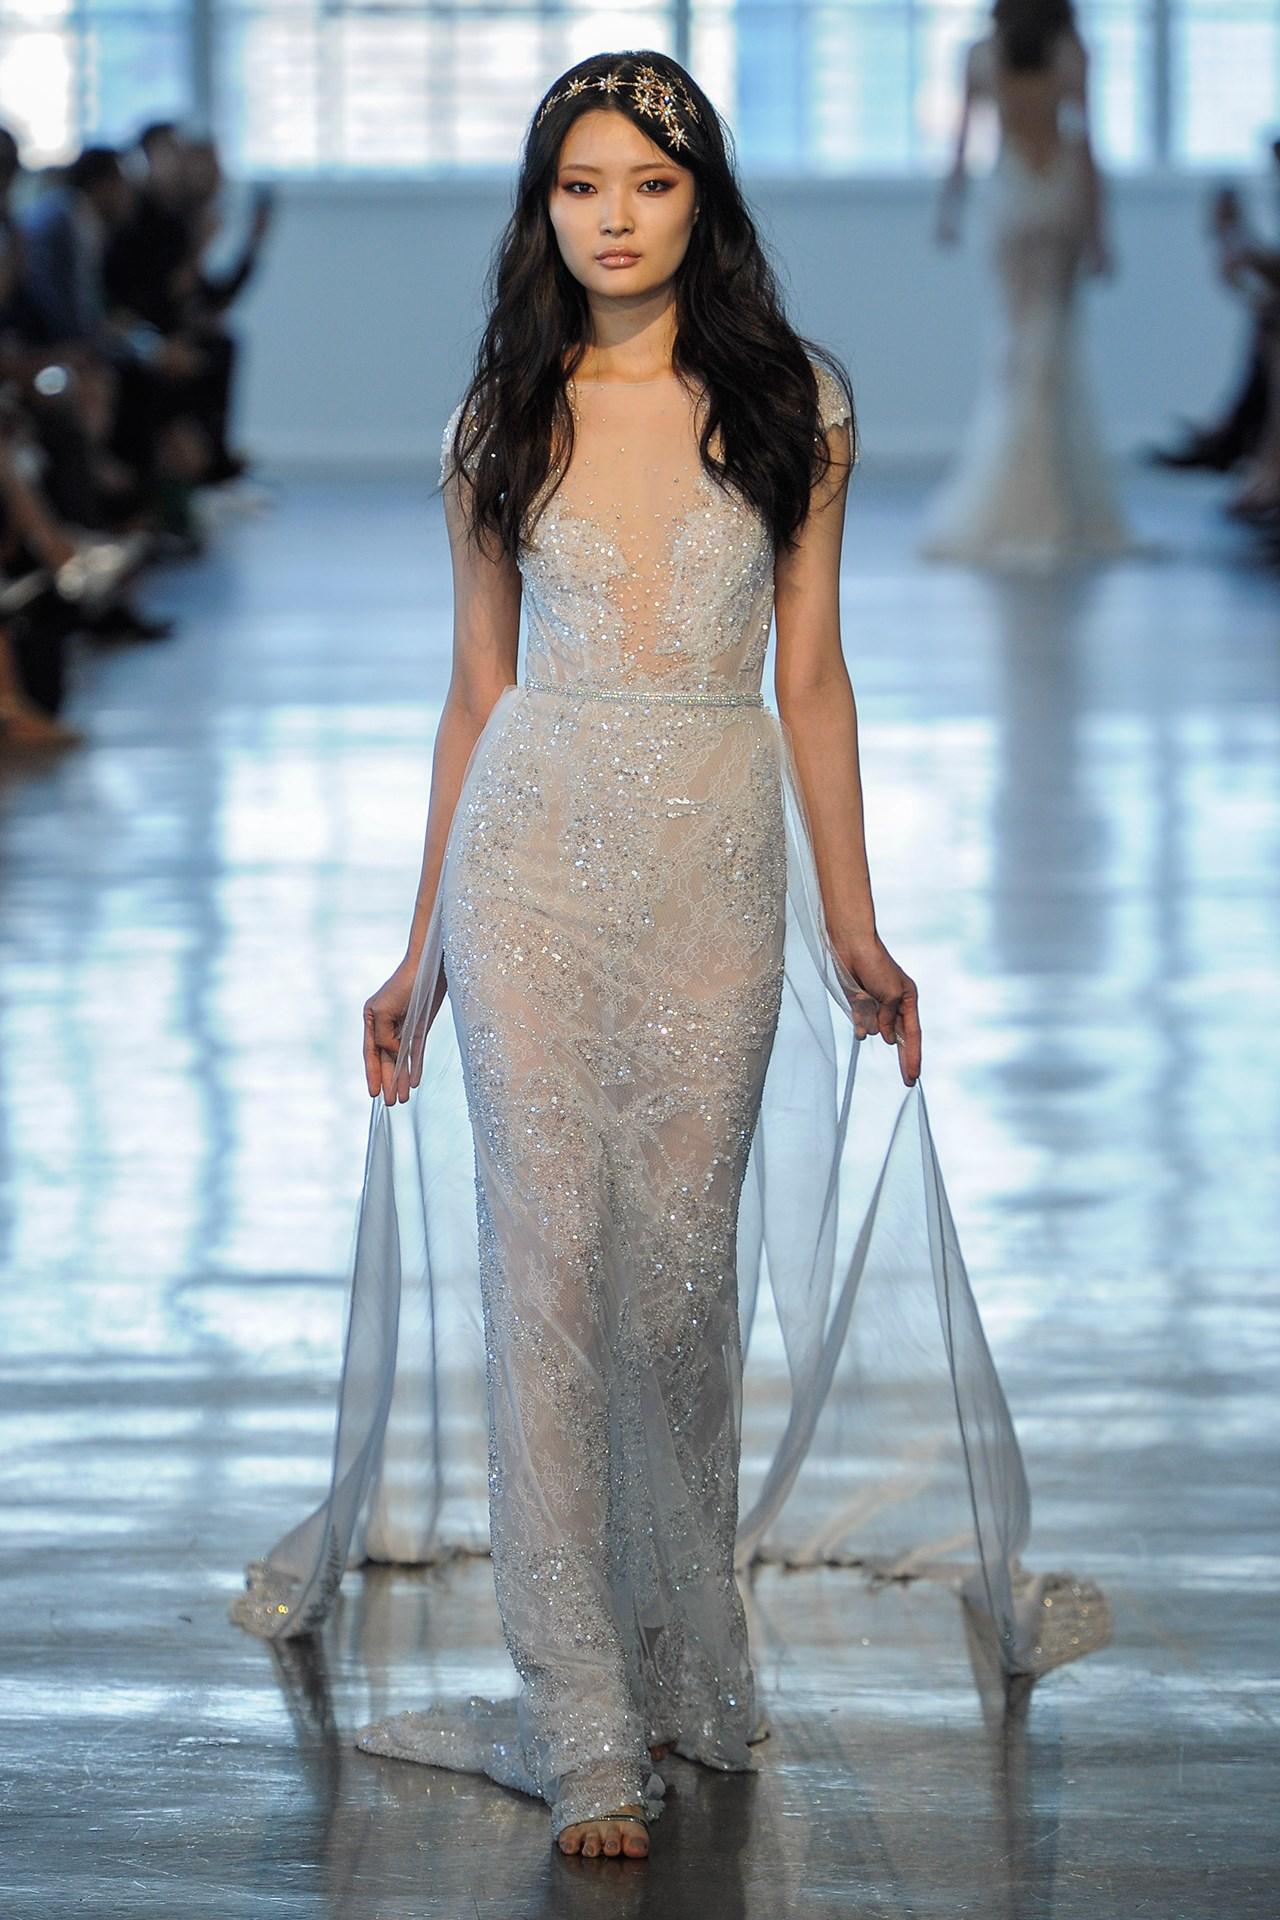 tendencia-vestido-noiva-2018-brilho-Berta